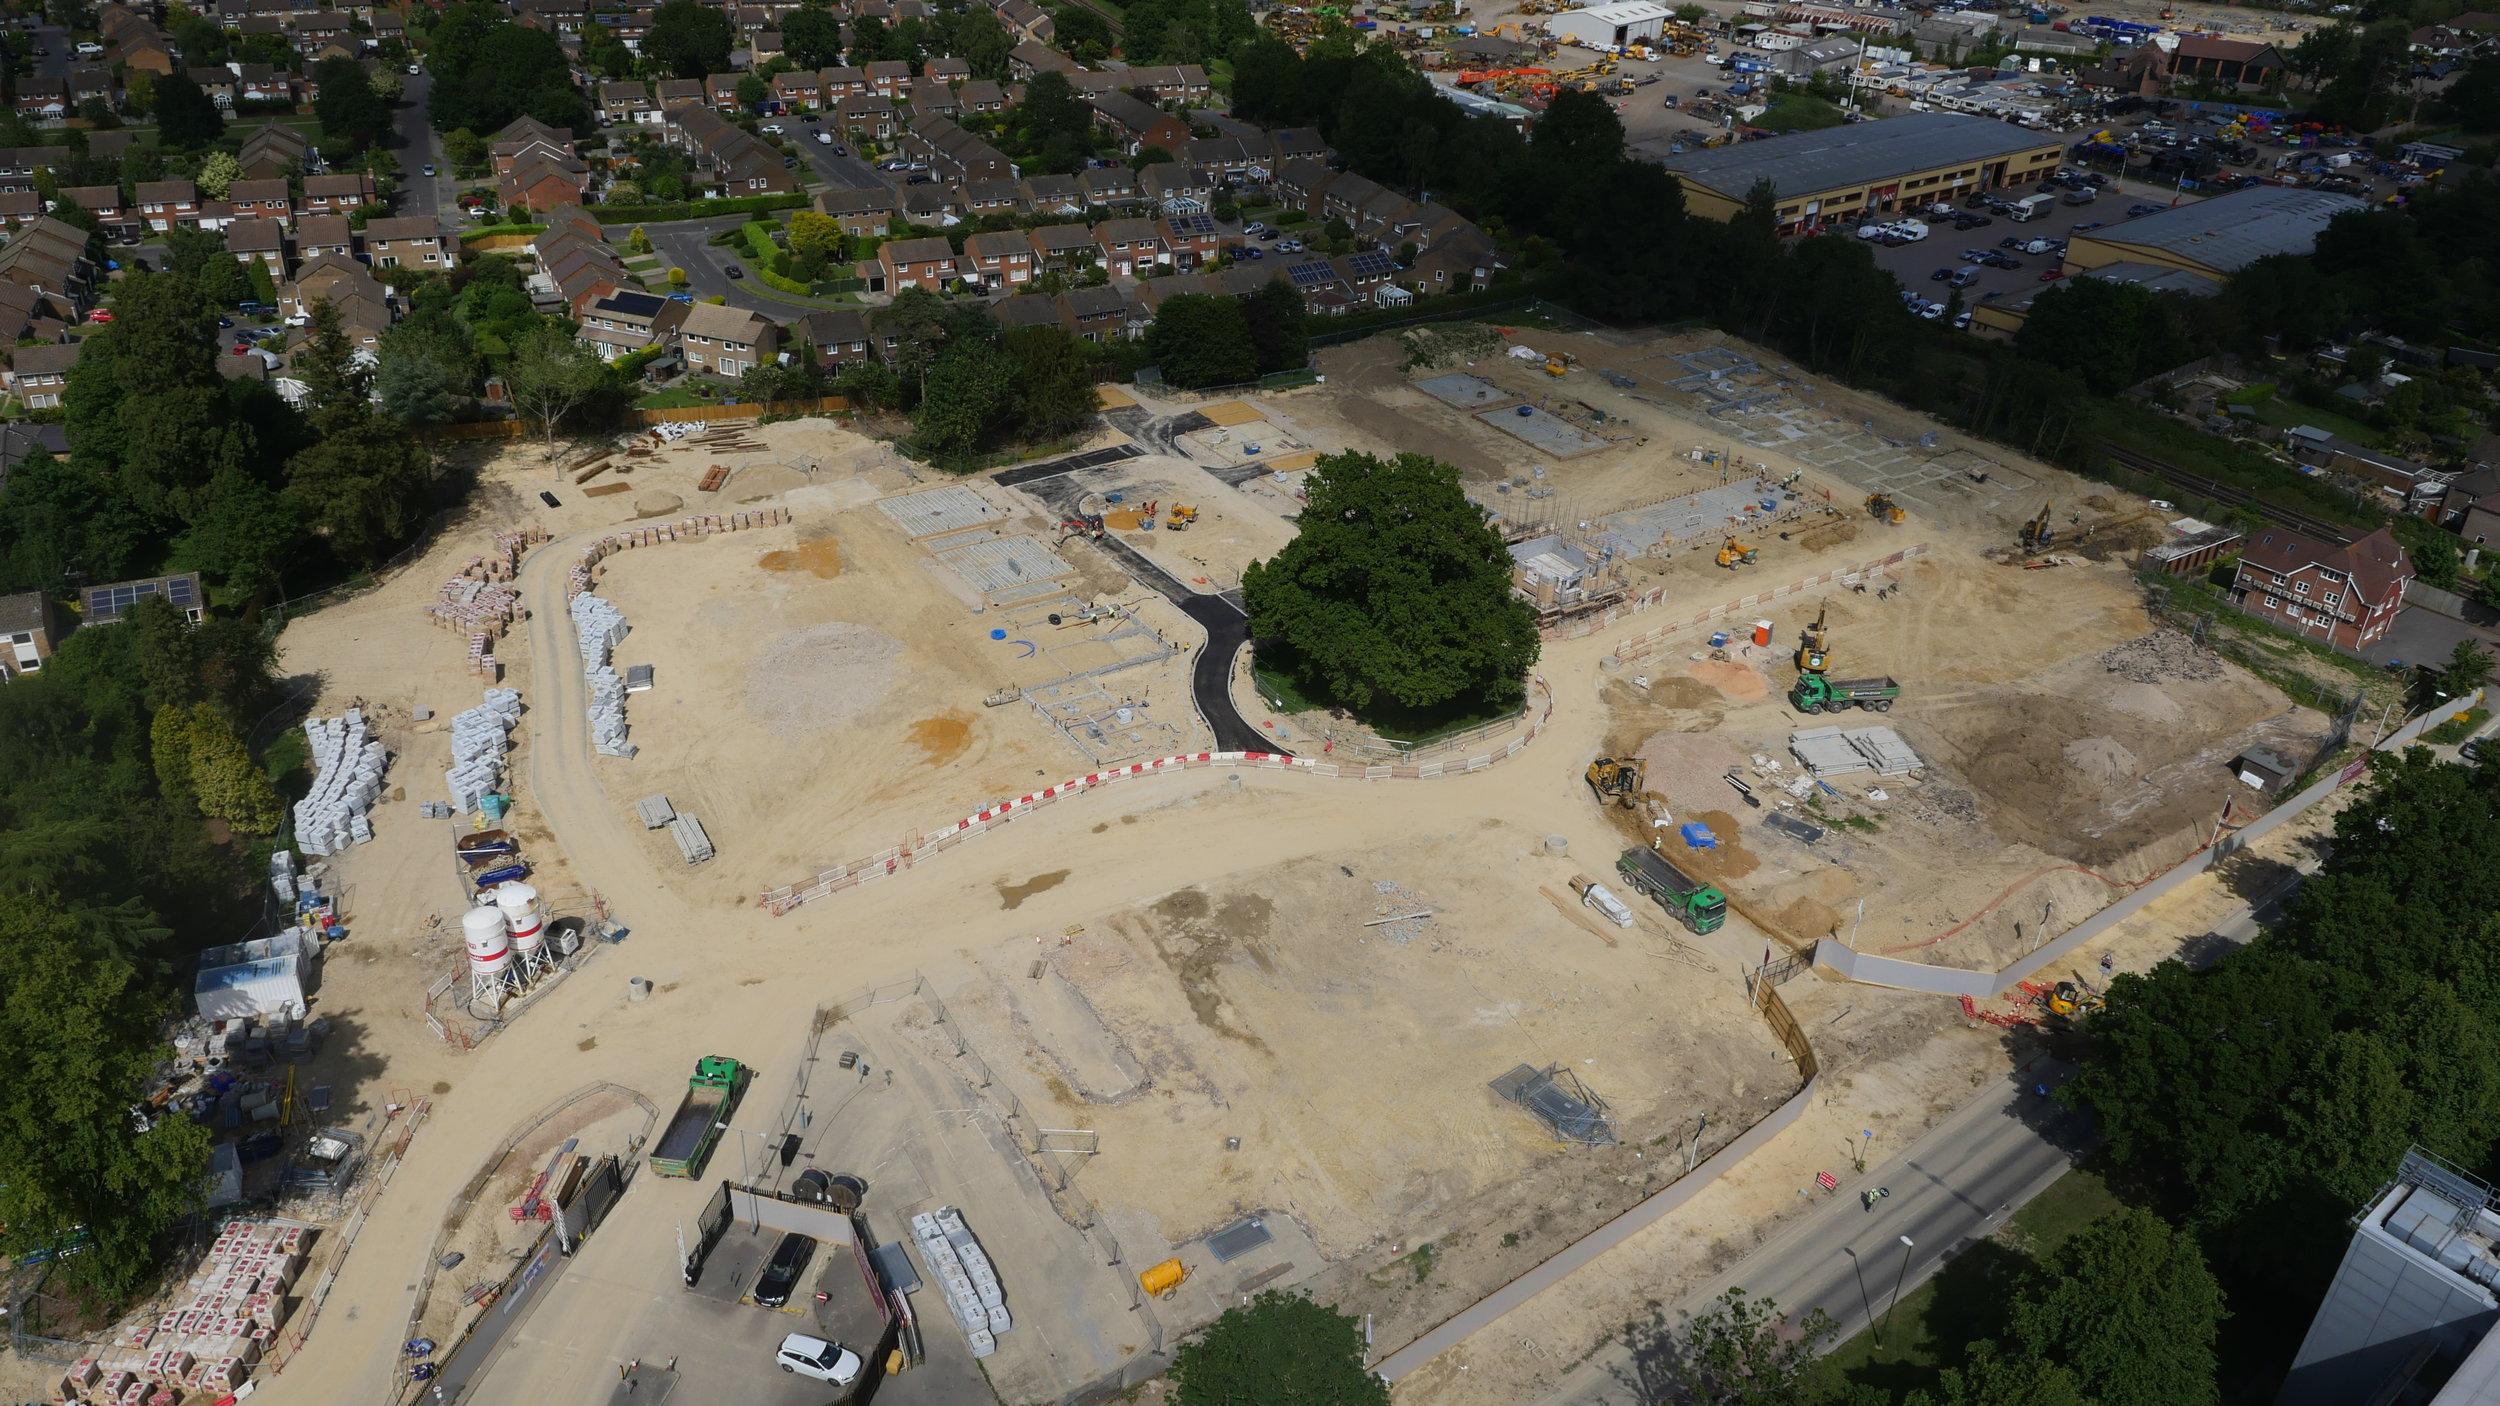 Drone Construction Site